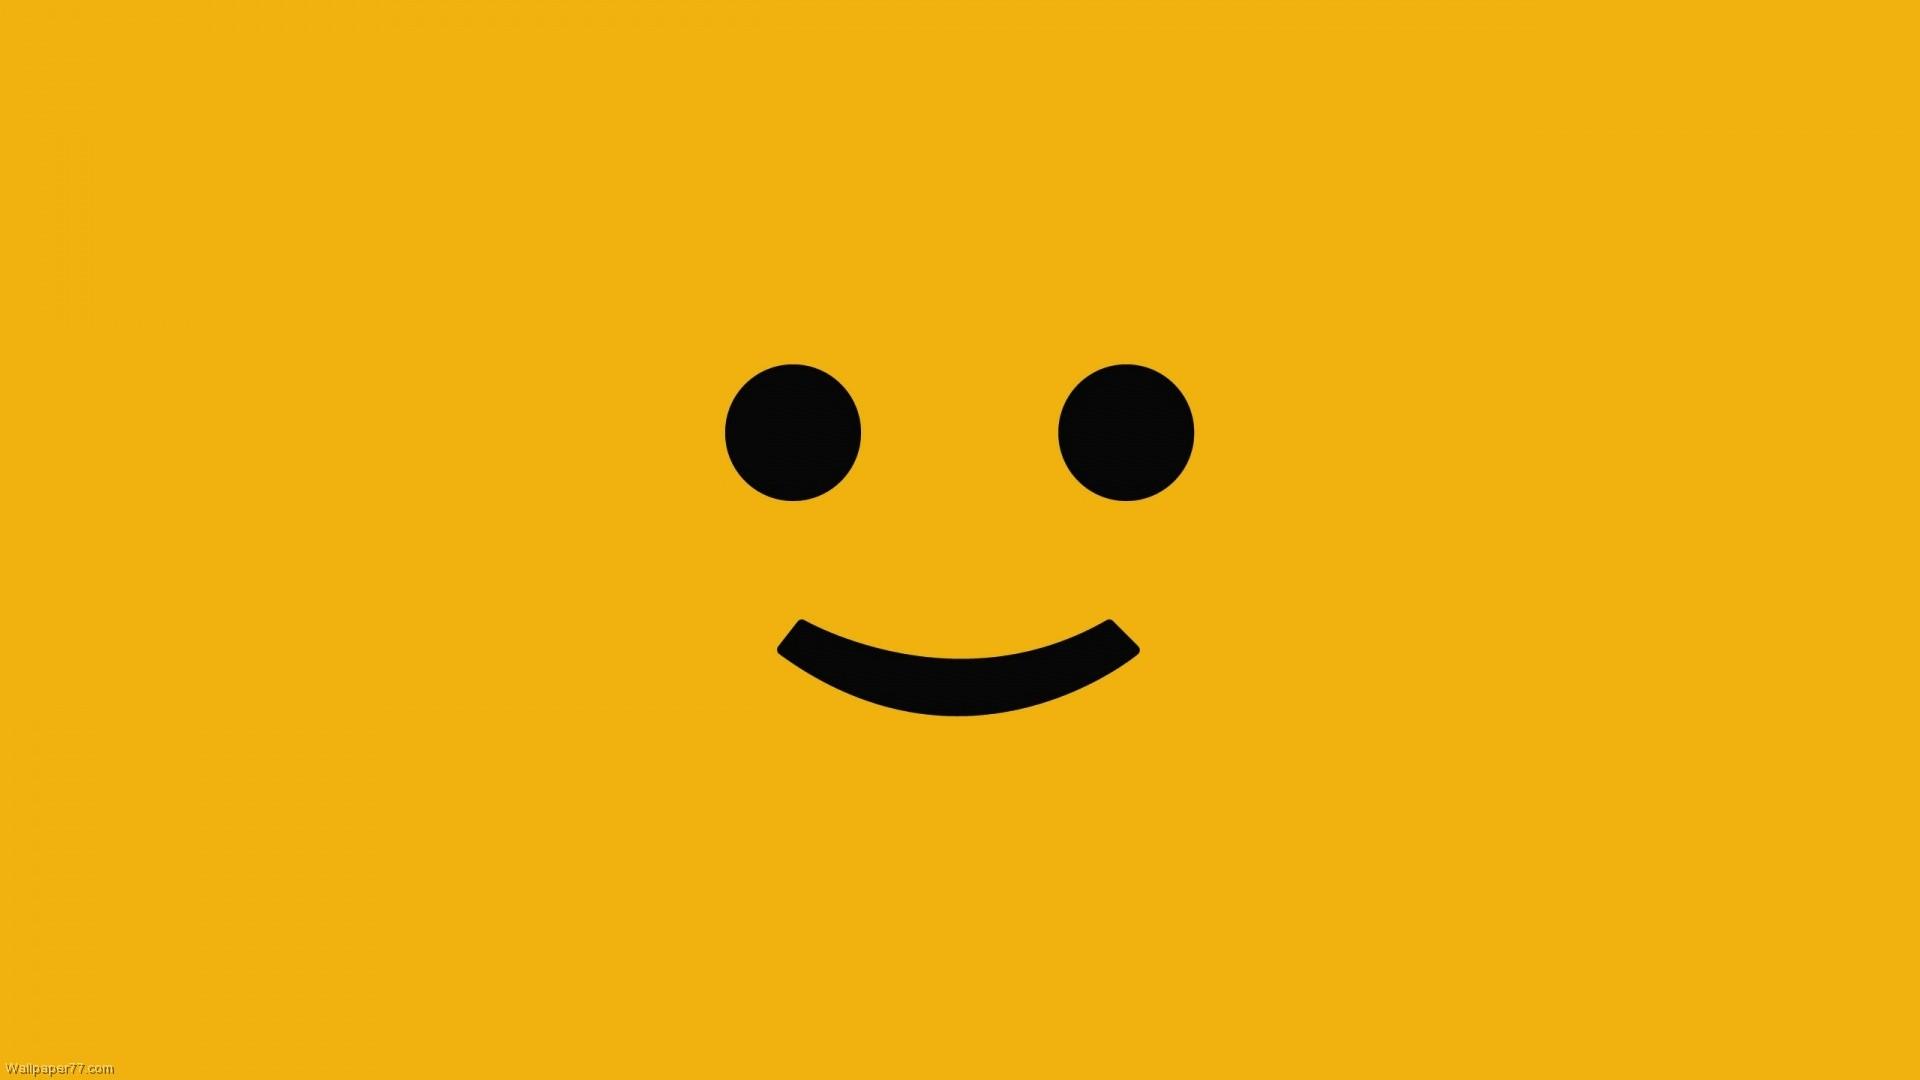 Cute Smiley Faces wallpaper   692540 1920x1080